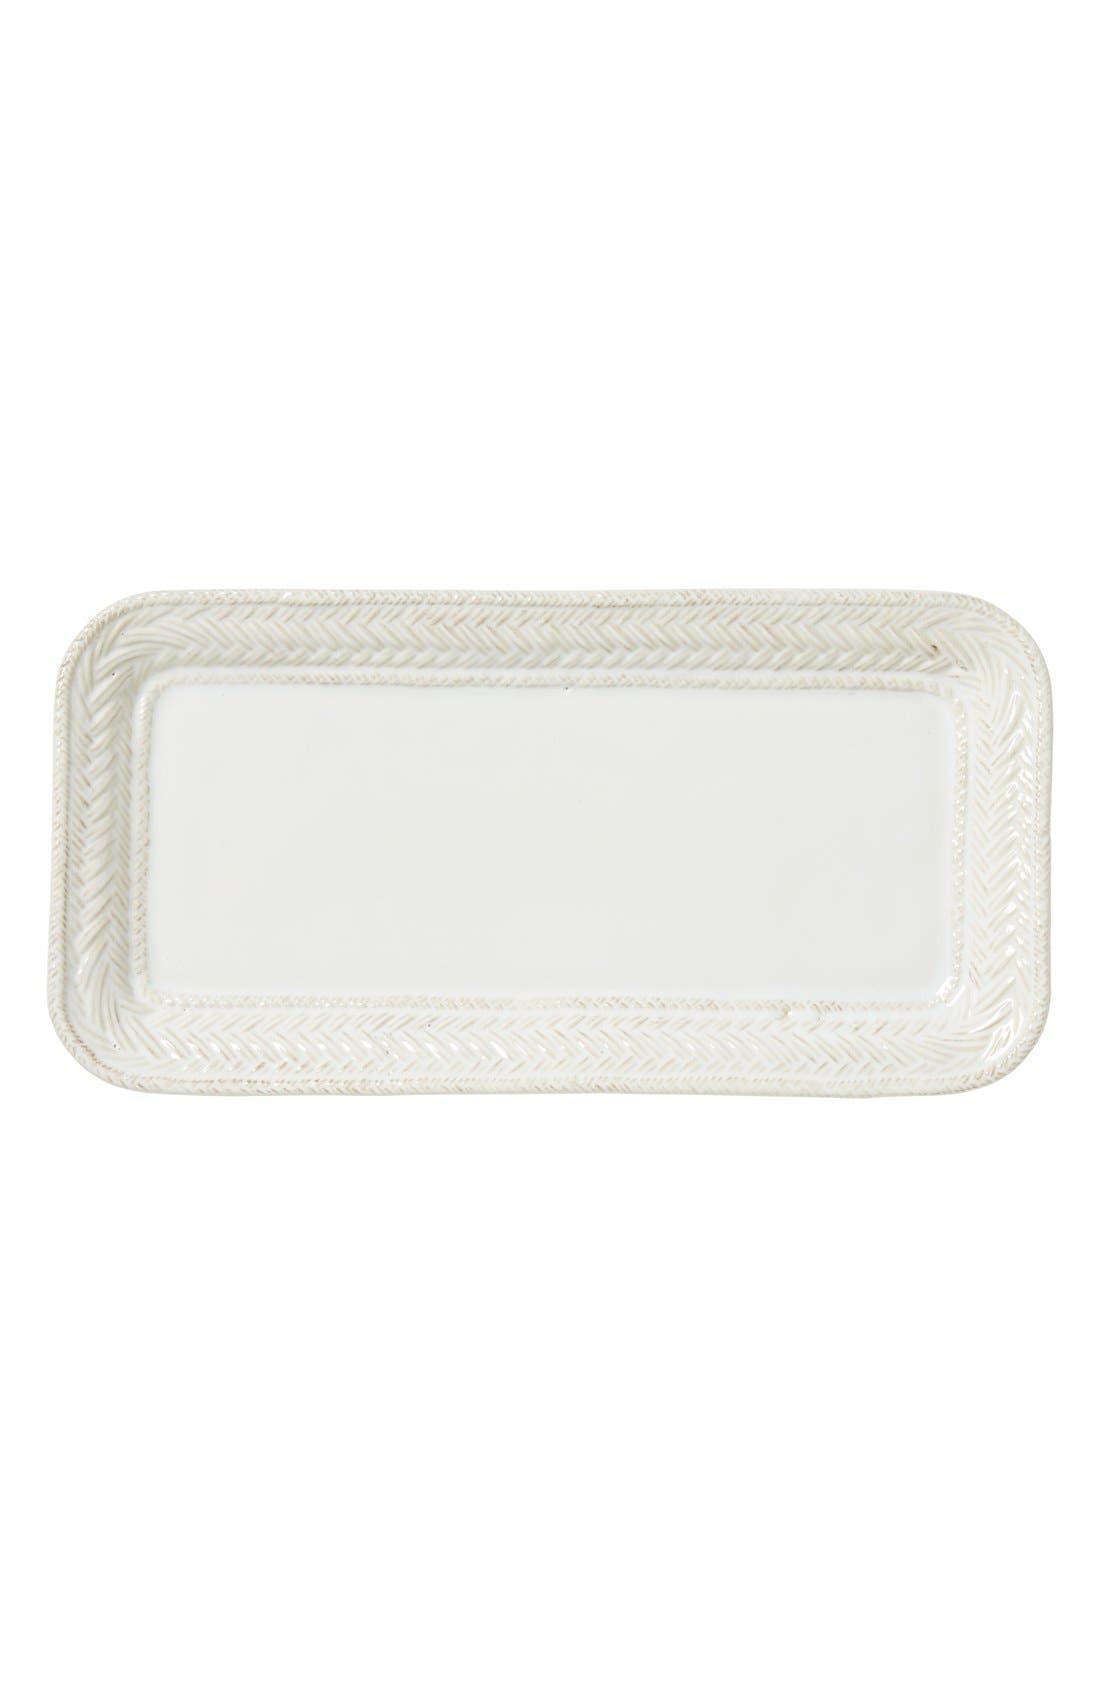 Le Panier Stoneware Hostess Tray,                         Main,                         color, White